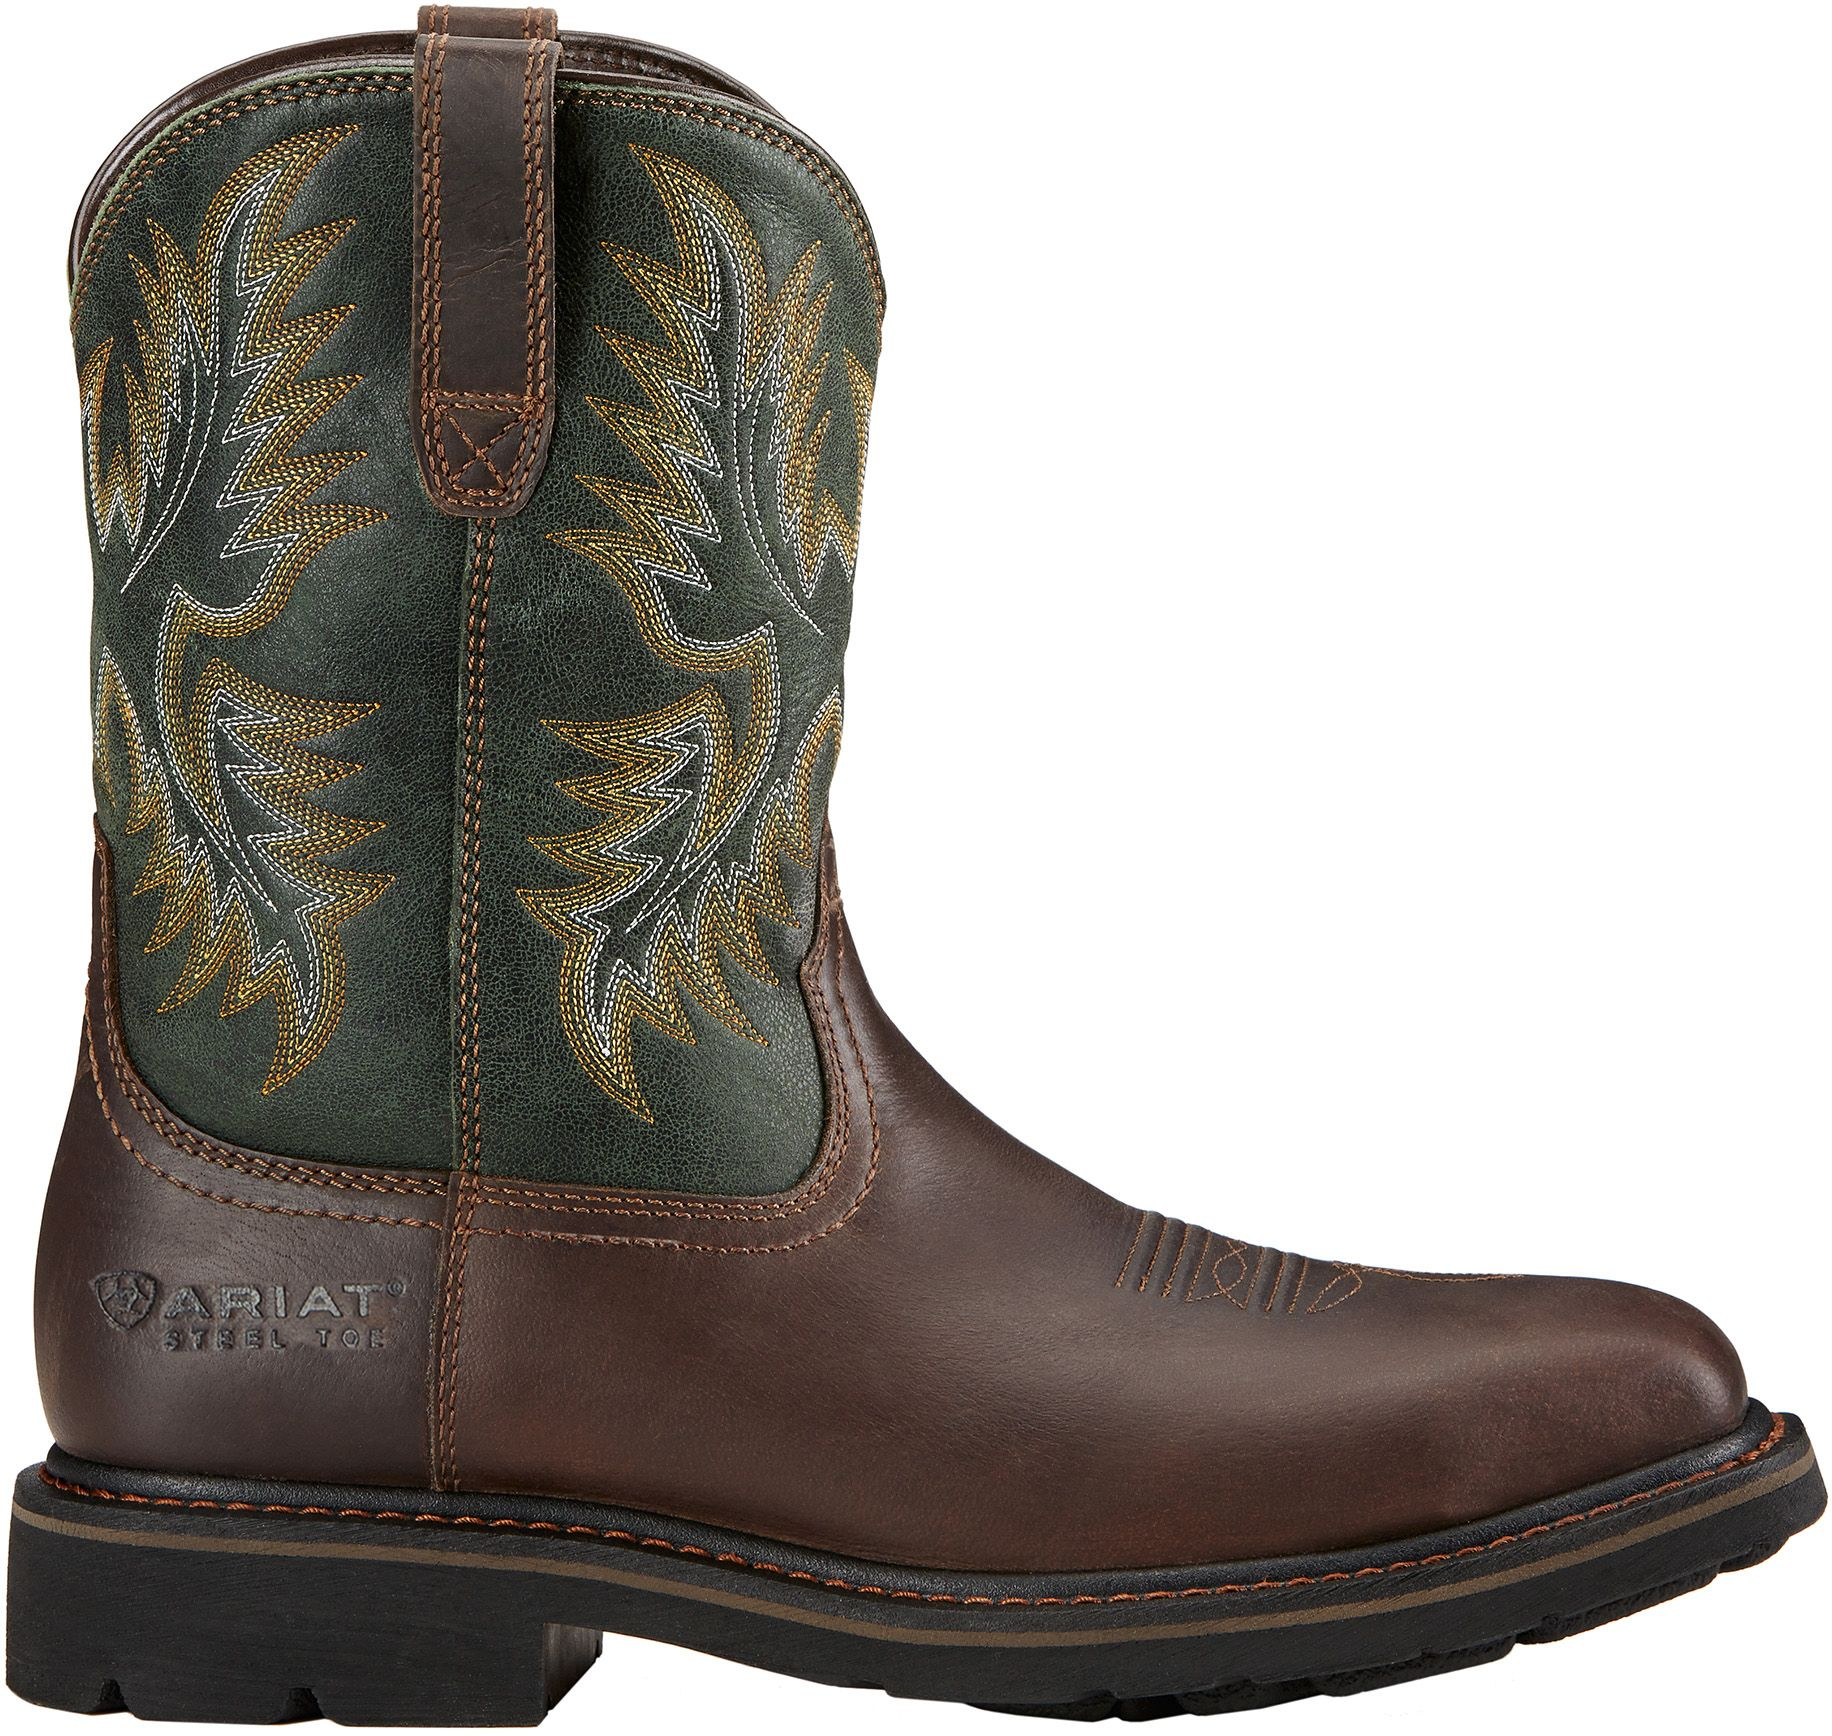 Ariat Steel Toe Work Boots Boot Ri